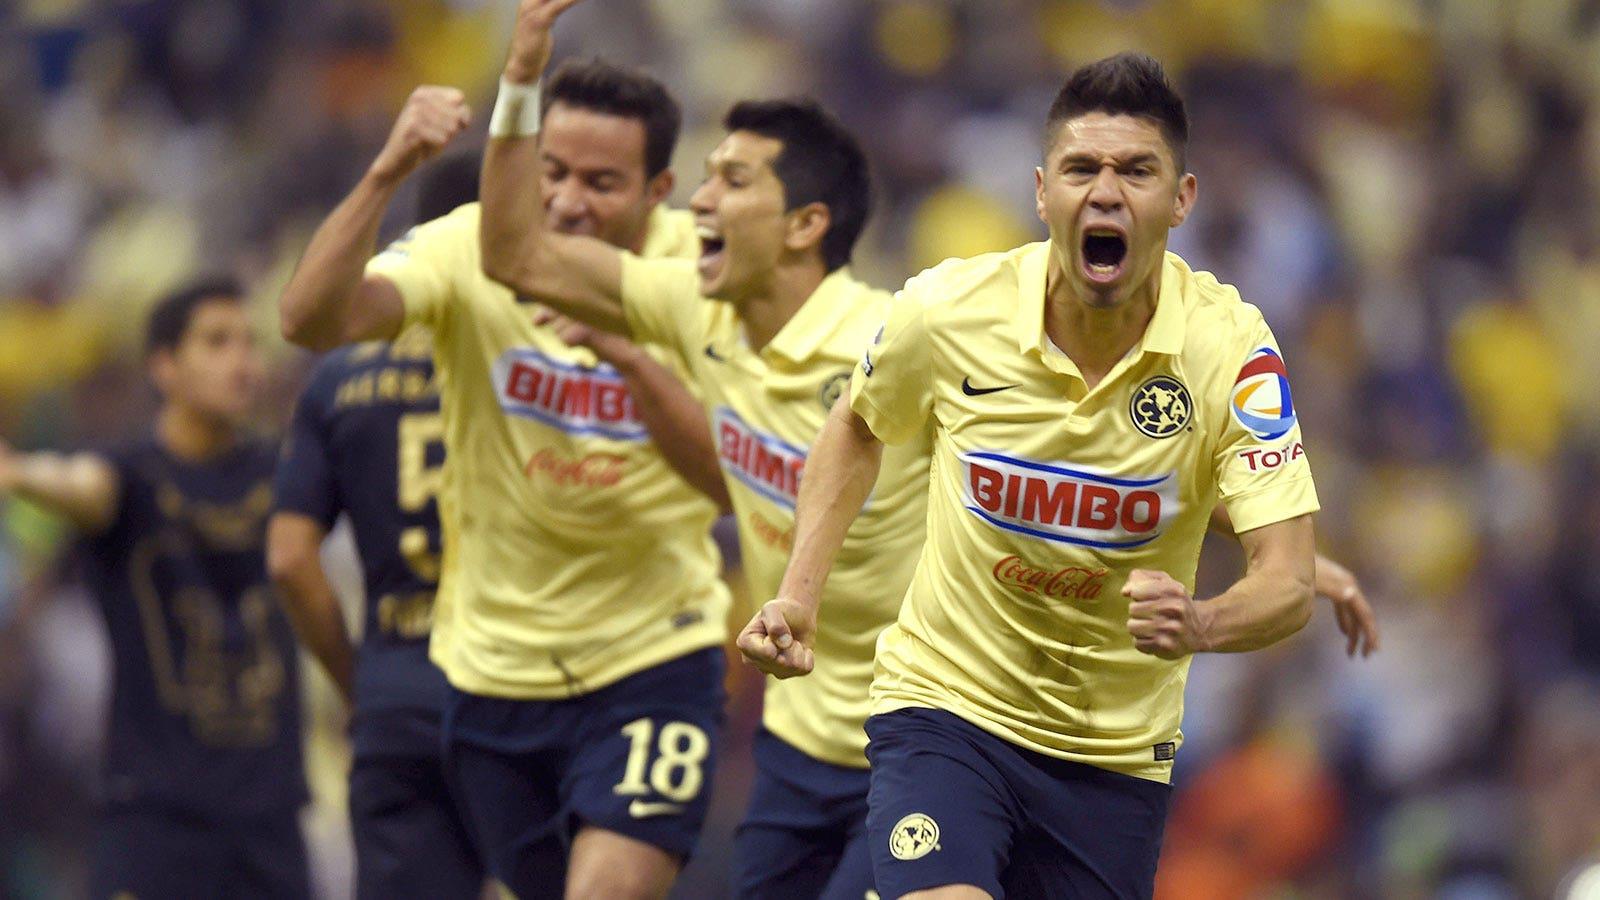 Club America capture elusive 12th league title, defeat